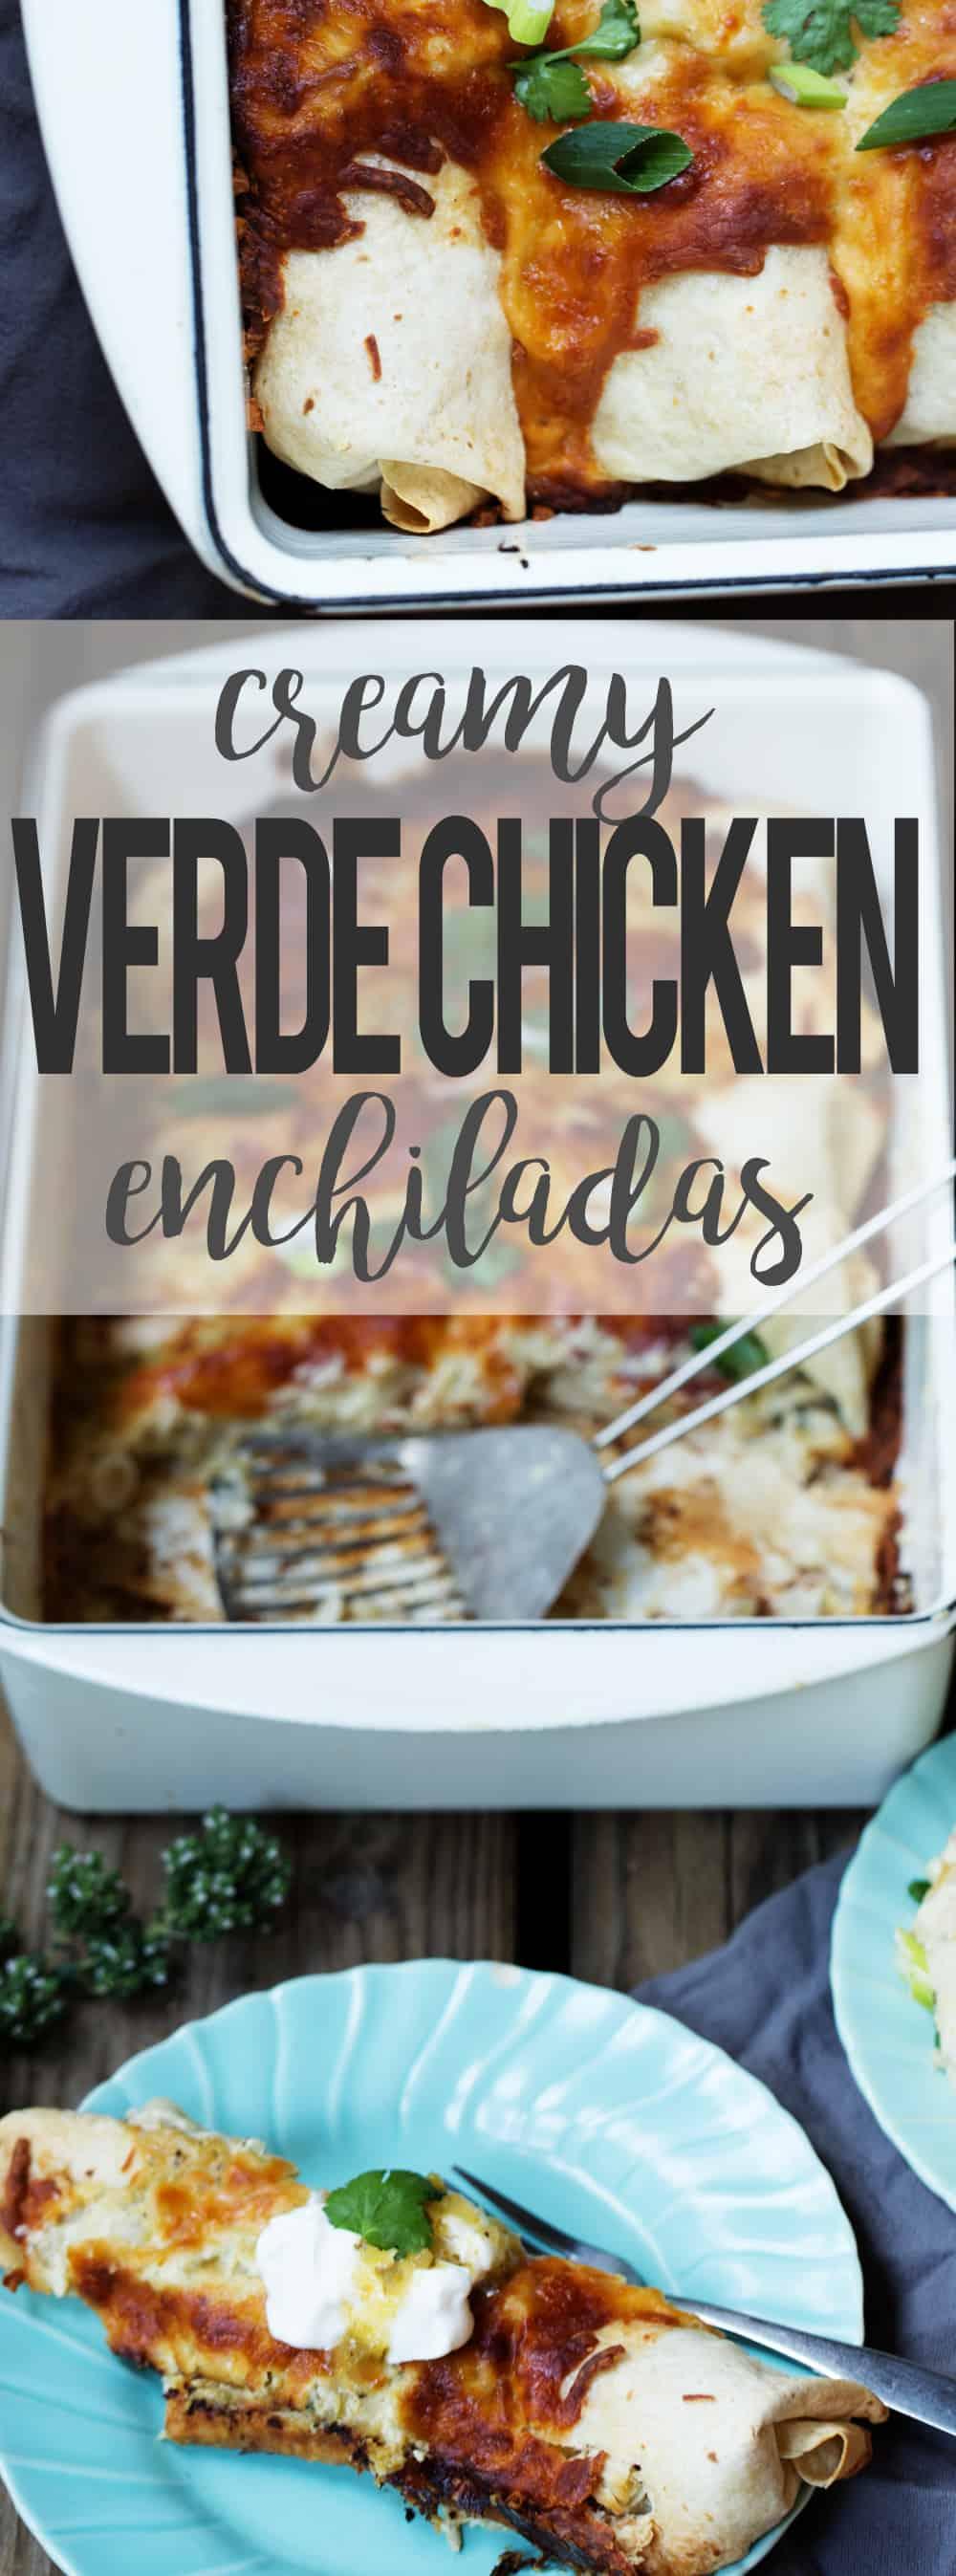 Creamy Chile Verde Chicken Enchiladas - easy meal for a crowd #MakeGameTimeSaucy